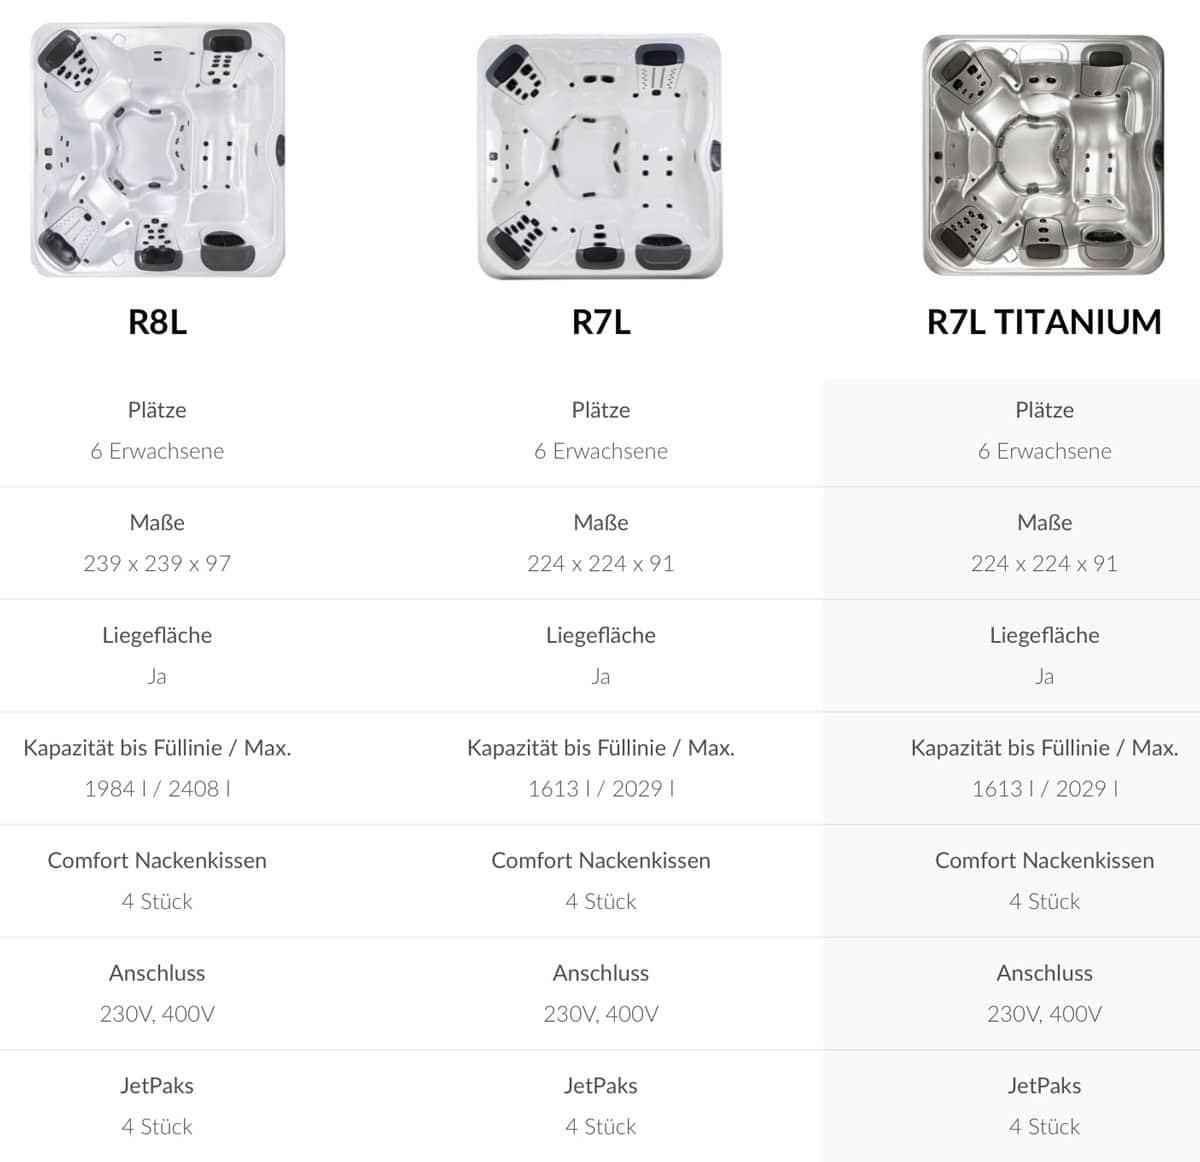 villeroy-boch-comfort-line-vergleich-r7l-titanium-edition